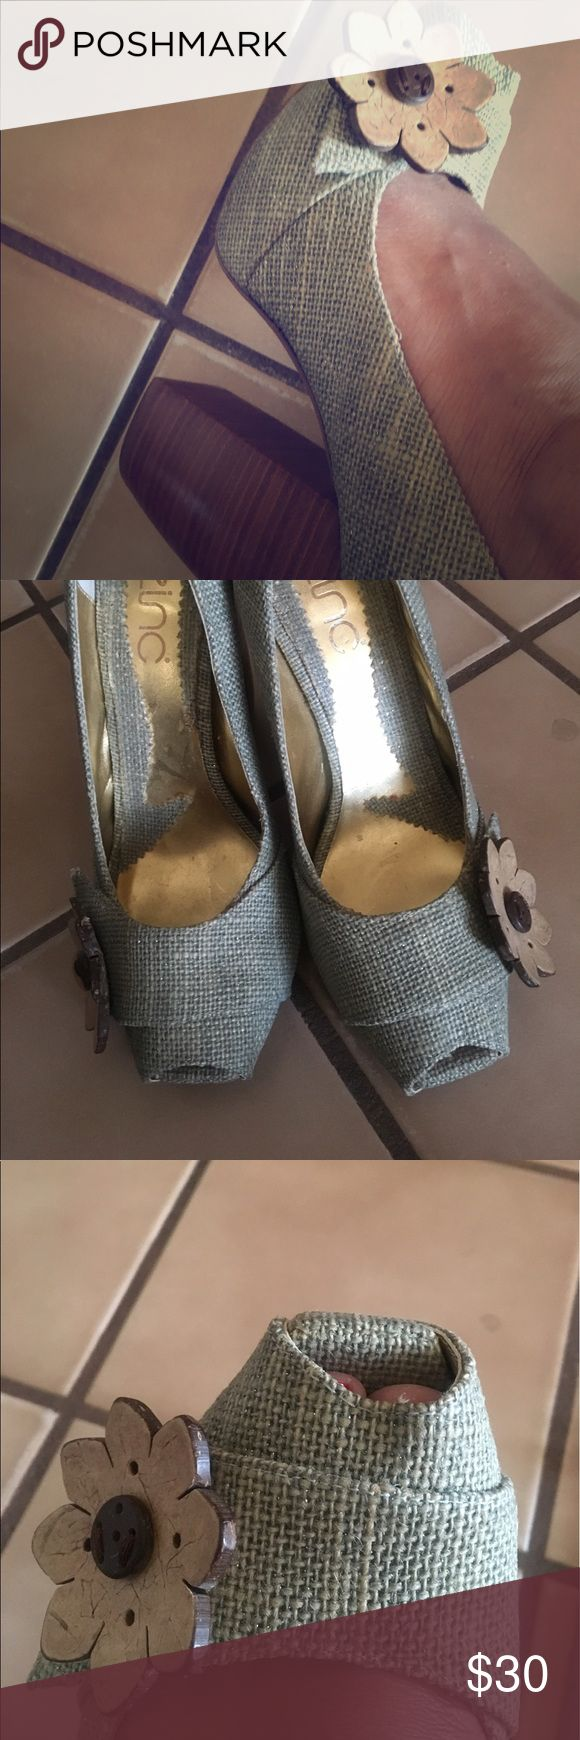 Women's peep toe chunky heel shoes. Women's peep toe chunky heel shoes. Mint  cute & comfy, with flower detail. Like New, One of a Kind! Without original shoe box. zinc Shoes Heels